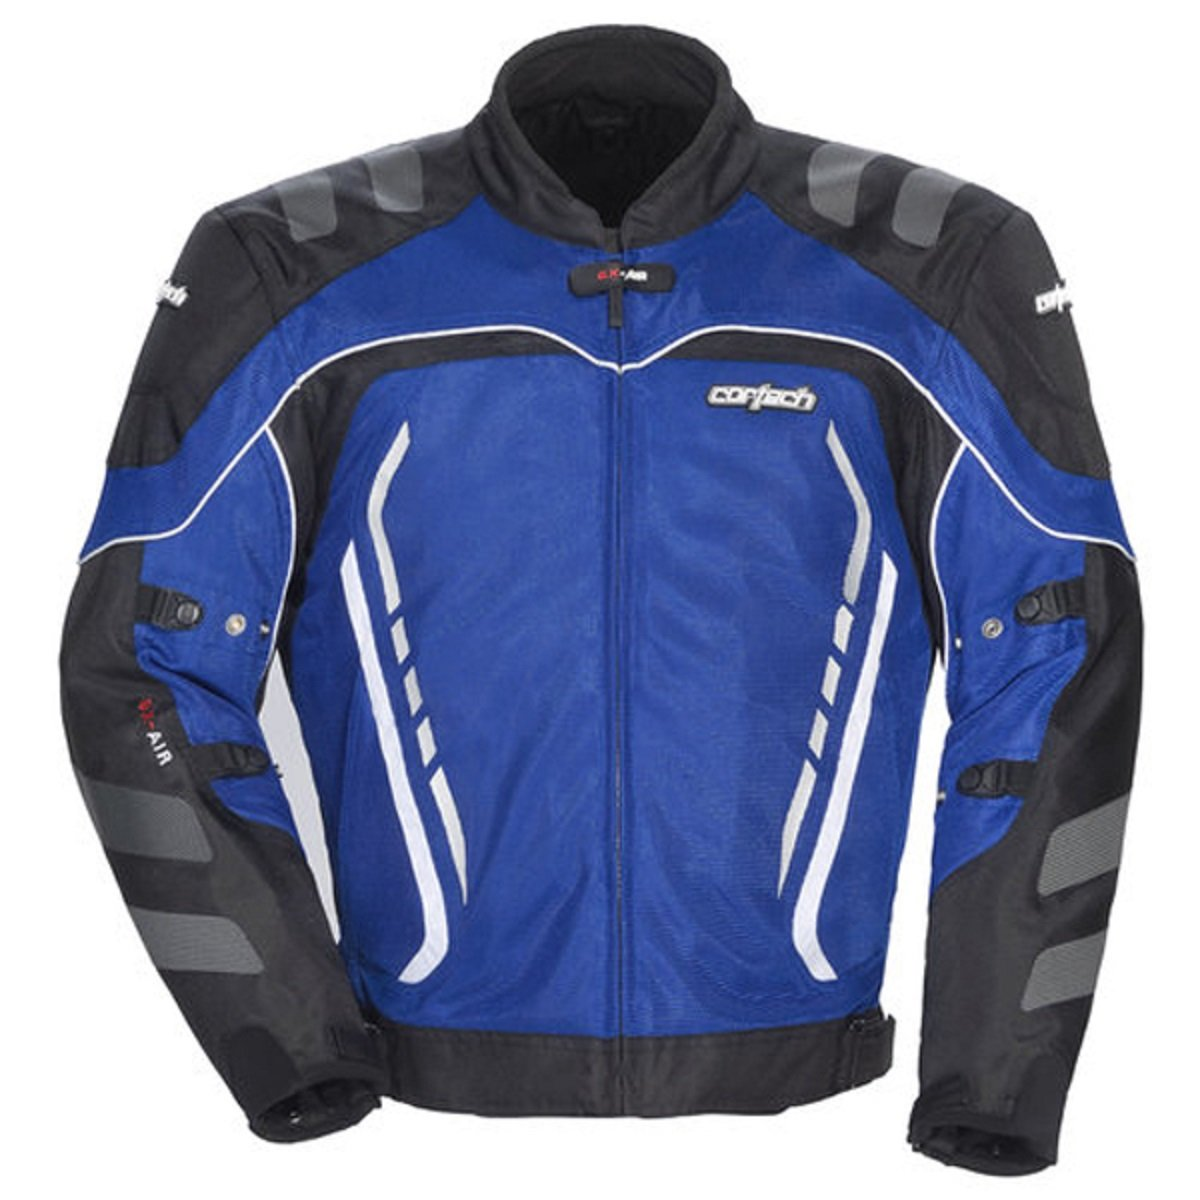 Amazon Com Cortech Gx Sport Air 3 Men S Mesh Armored Motorcycle